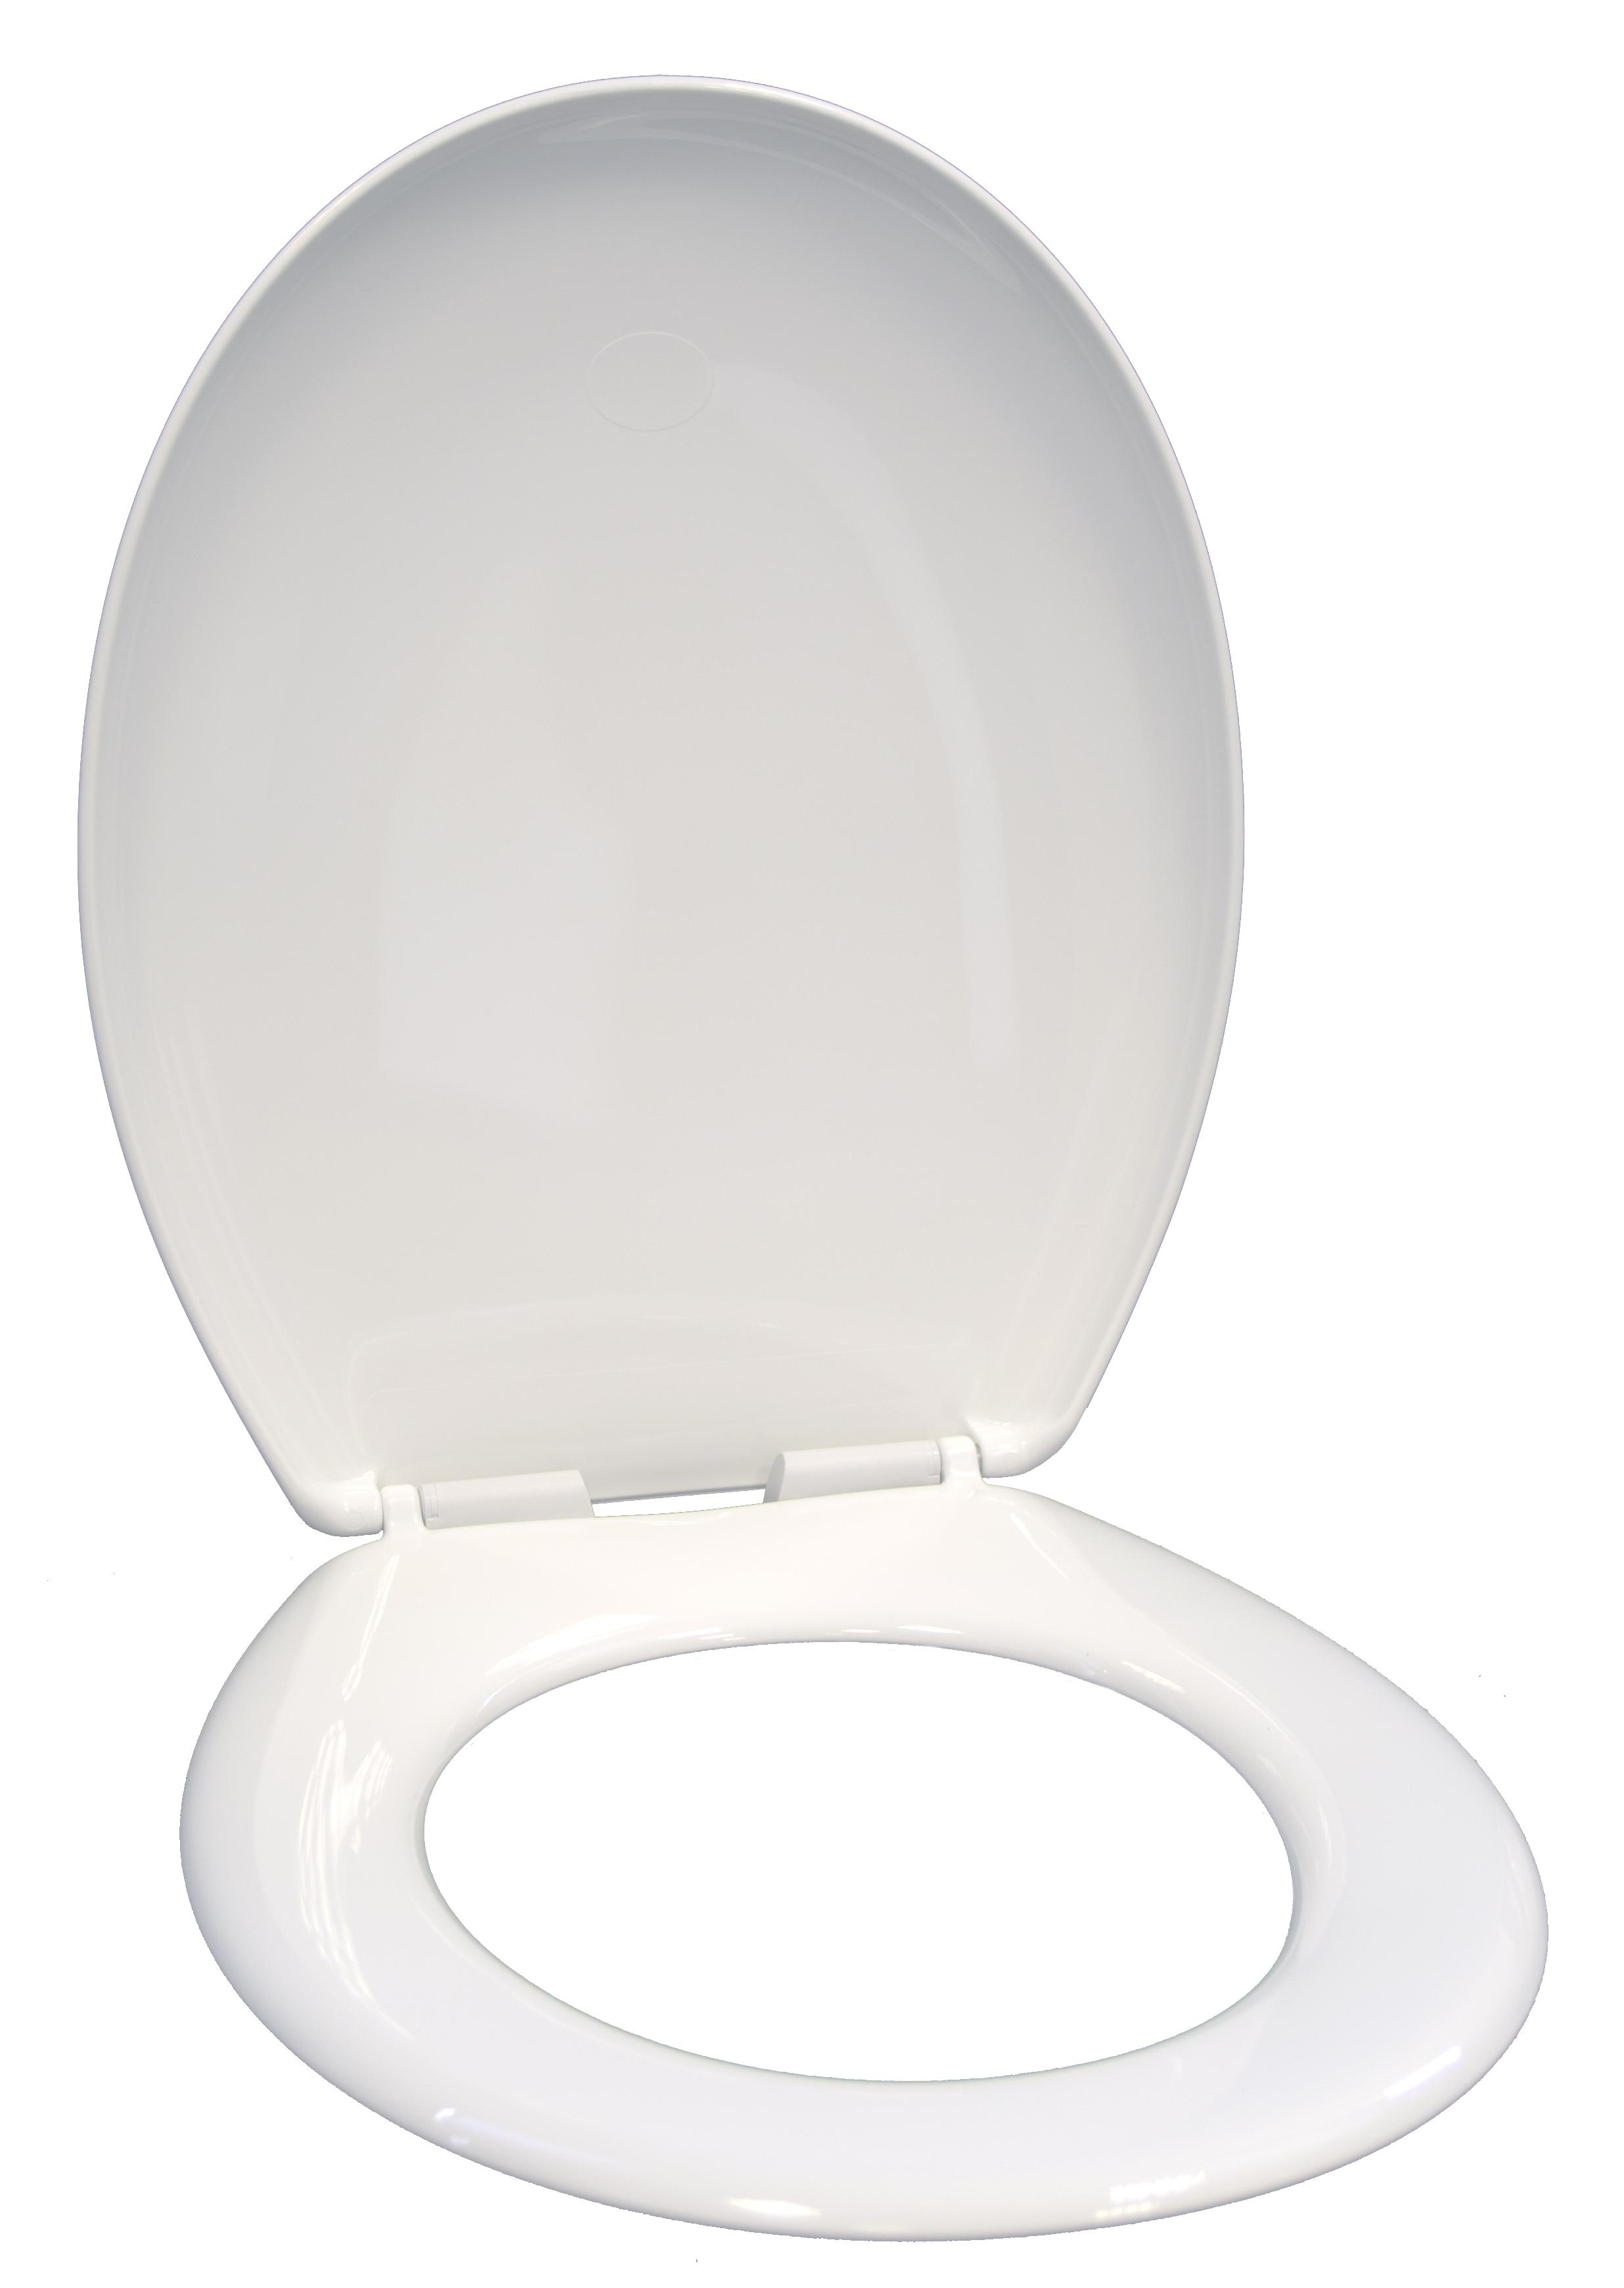 Lecico | Atlas | STWHSSUNP | Toilet Seat